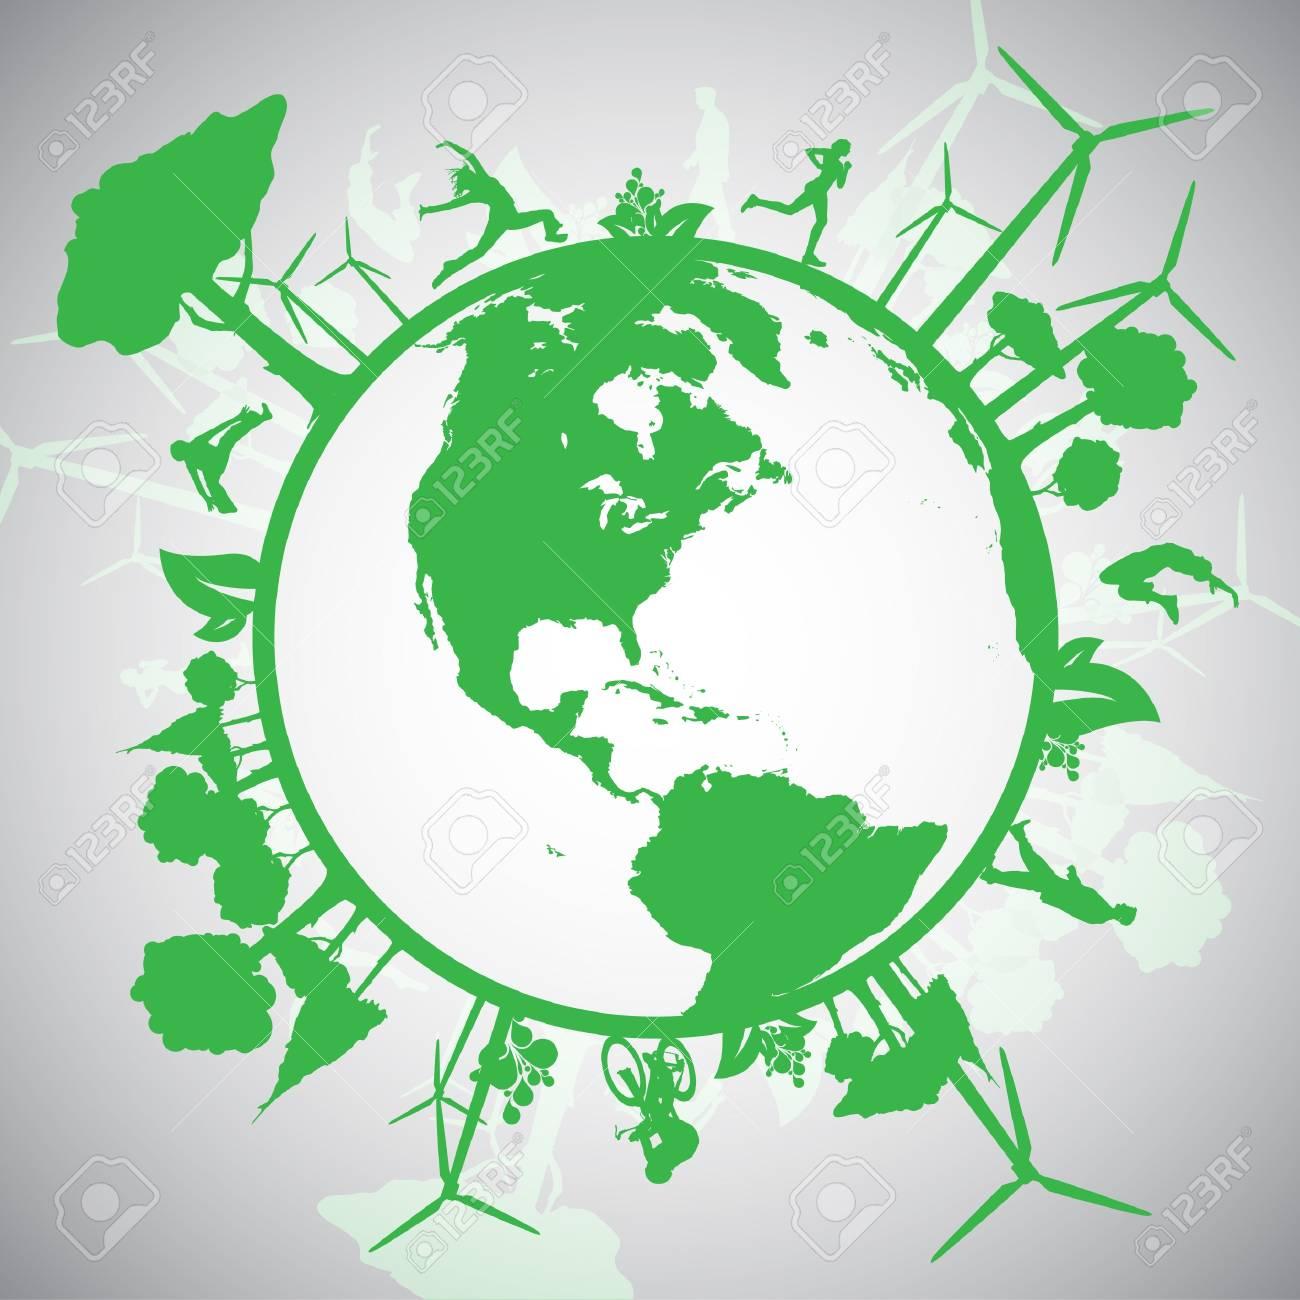 Green Eco World Stock Vector - 17528286